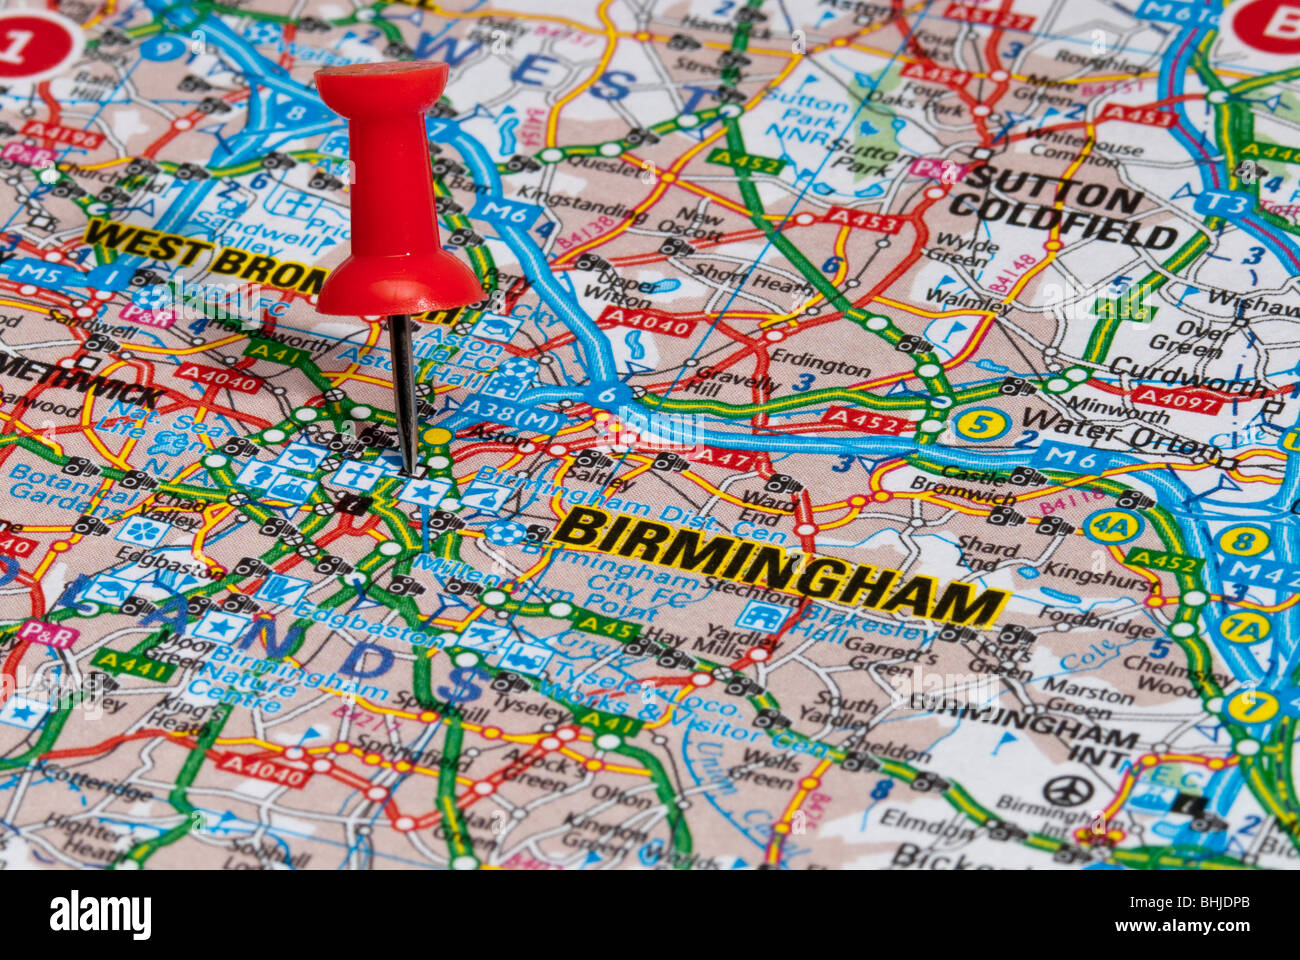 West Midlands Uk Map Stock Photos  West Midlands Uk Map Stock